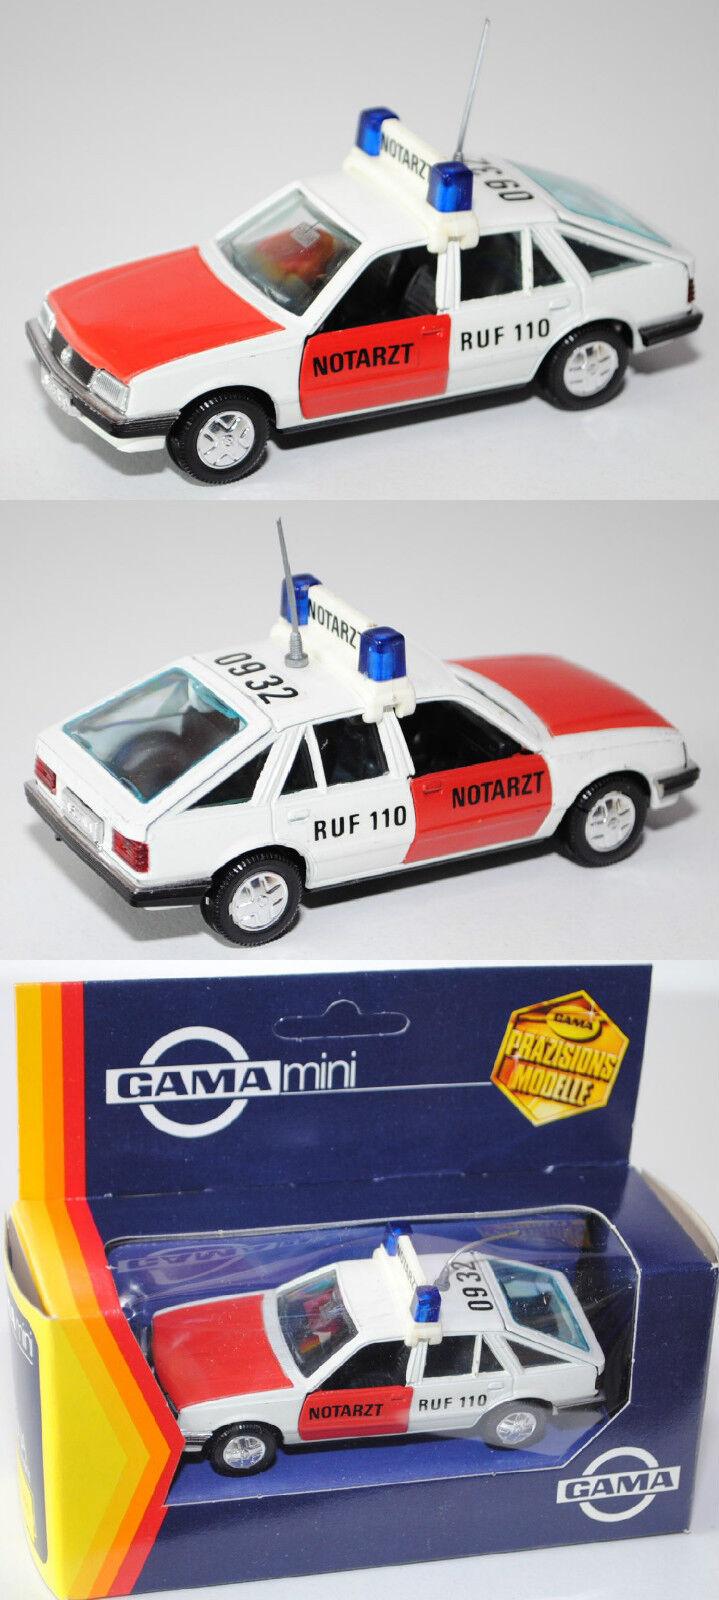 Gama Mini 1171 OPEL ASCONA 1.6 S (Type c1, quatre portes, berline) ambulance, 1 43